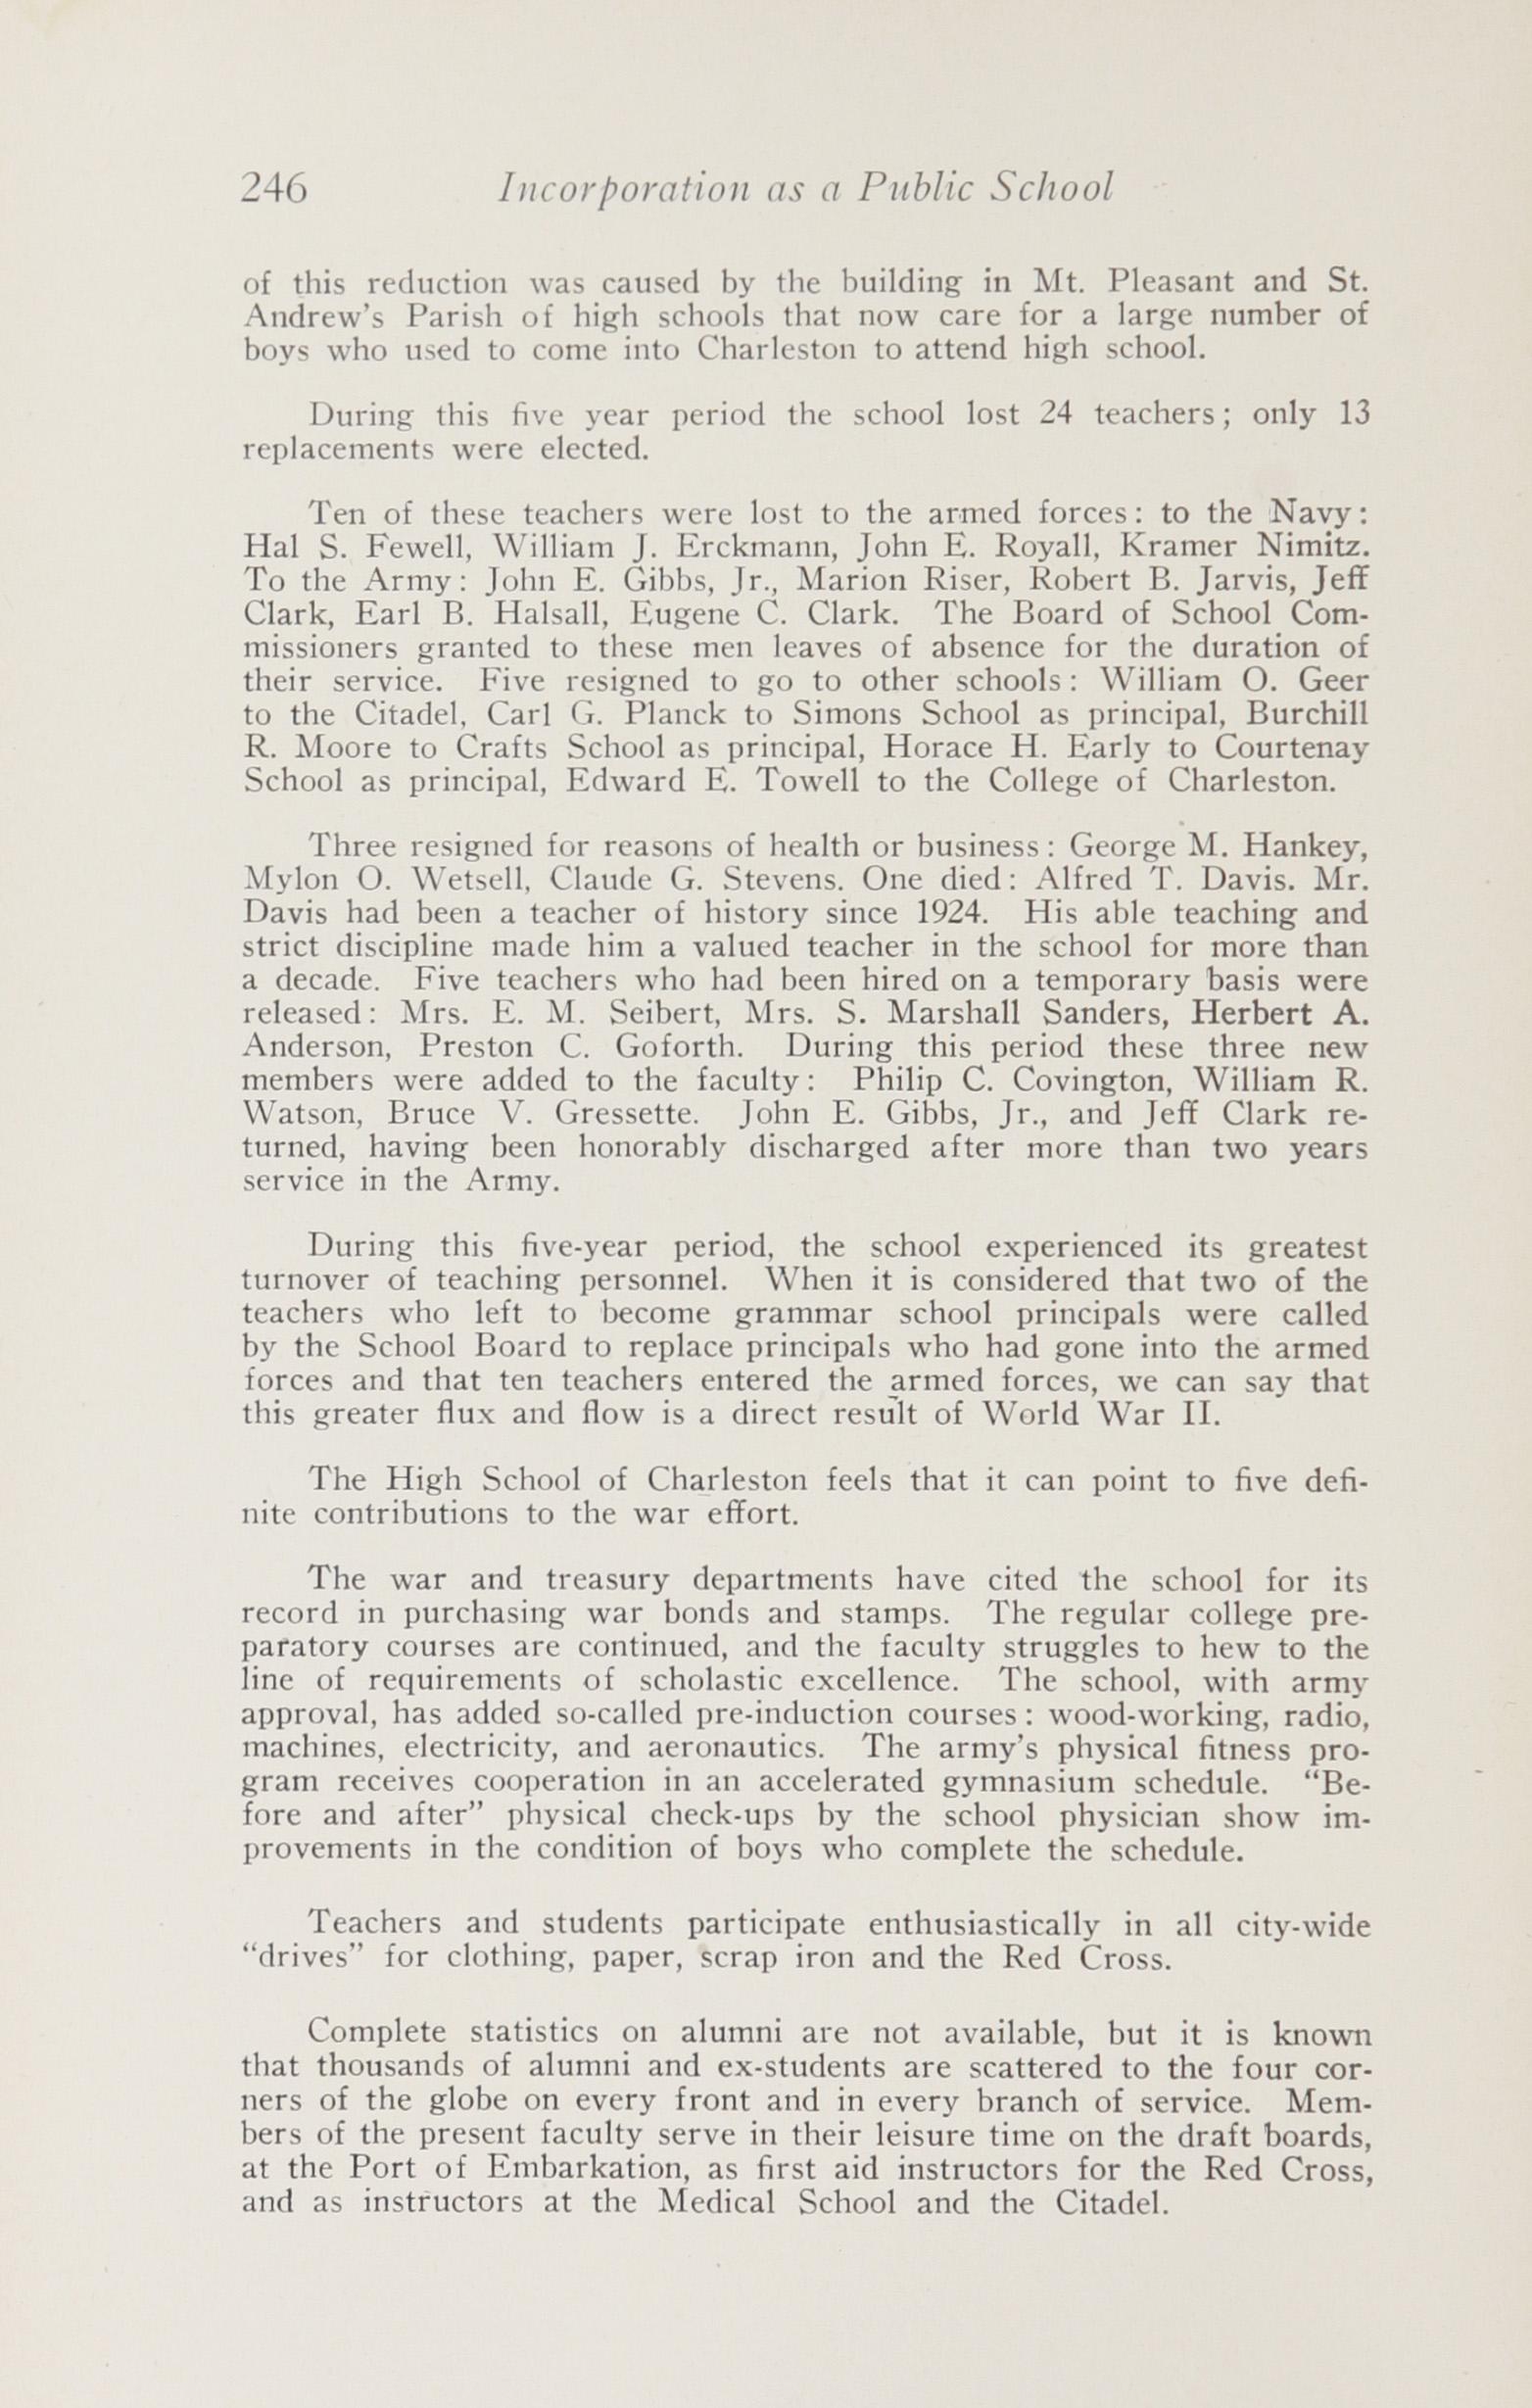 Charleston Yearbook, 1943, page 246